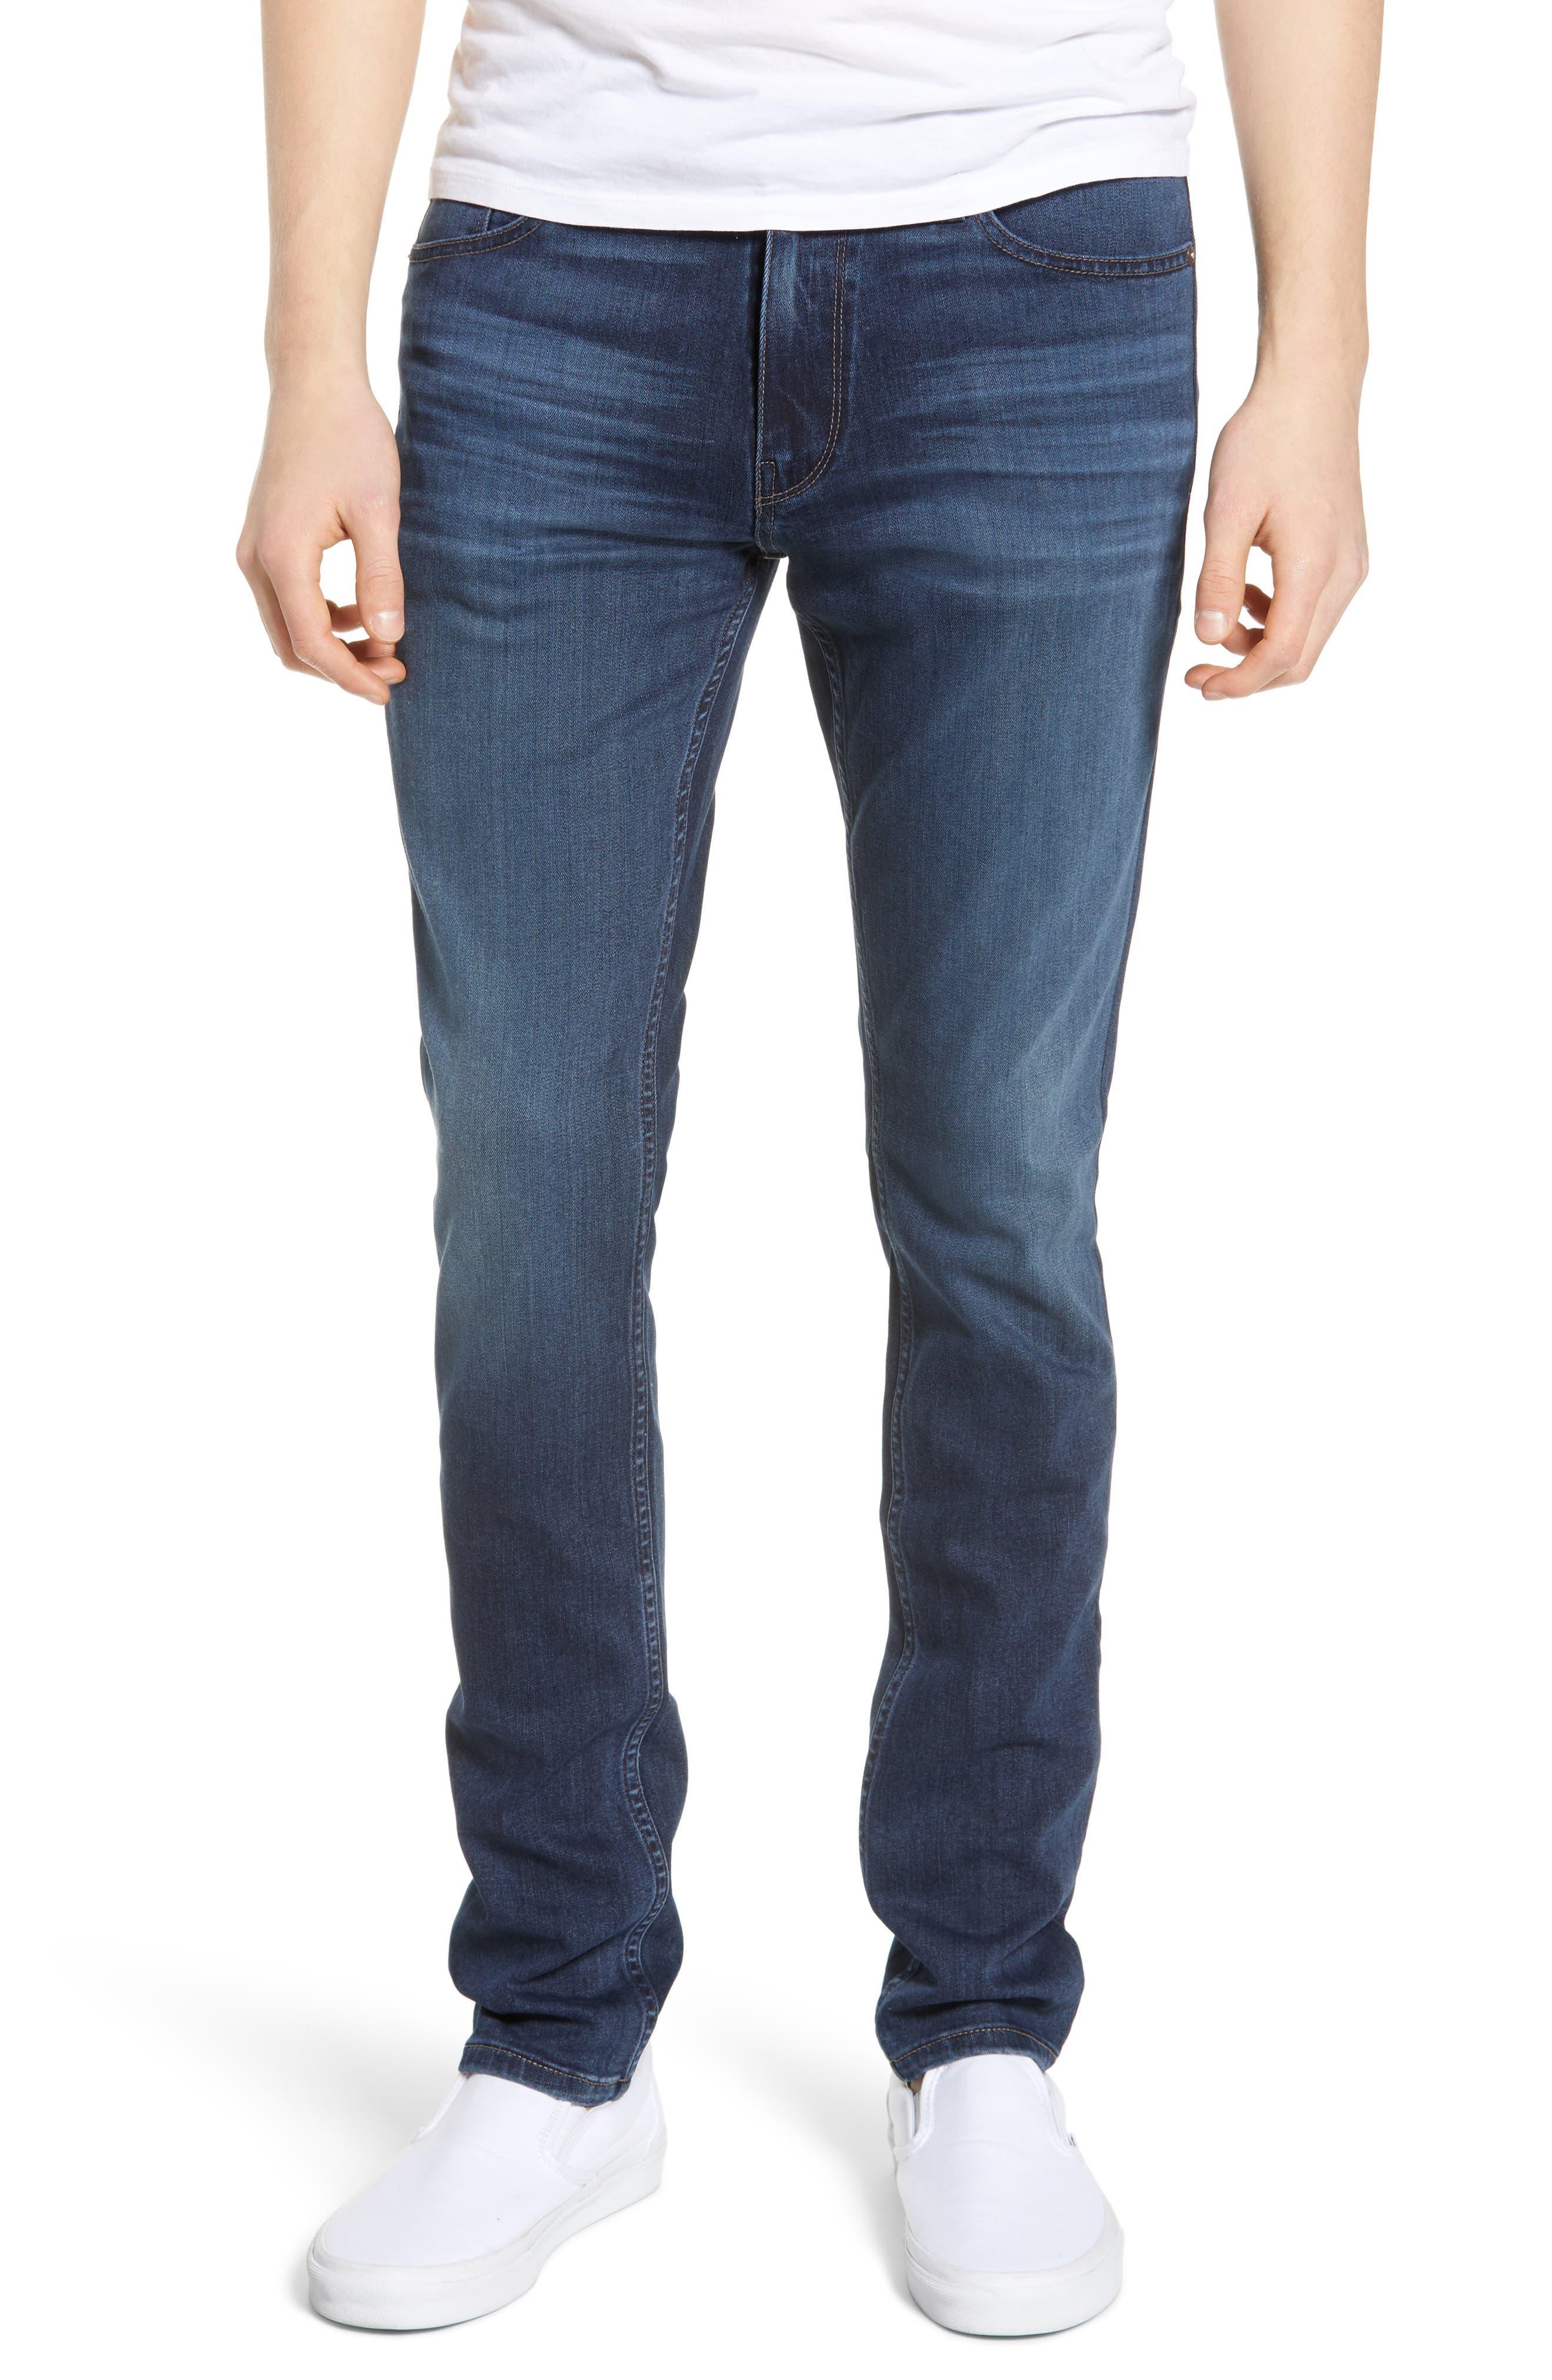 Transcend - Croft Skinny Fit Jeans, Main, color, HUXLEY